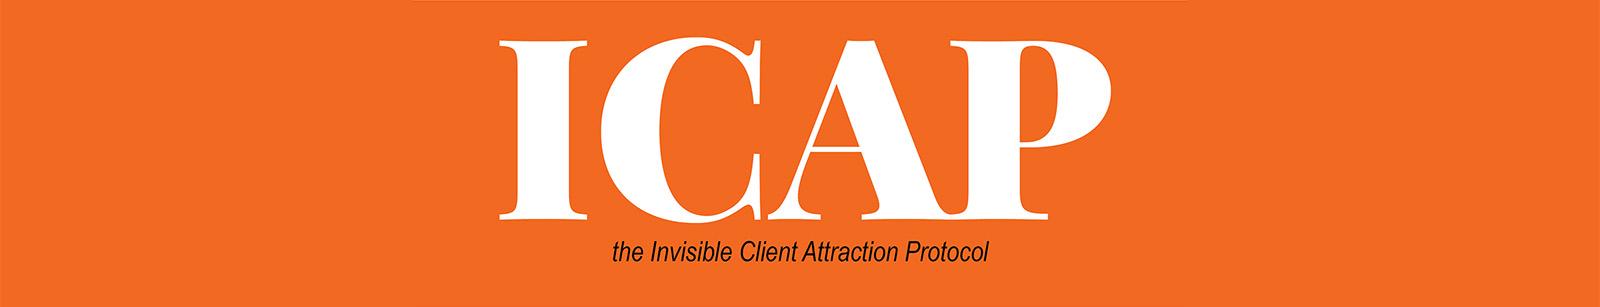 ICAPlogov1-websize-wide.jpg